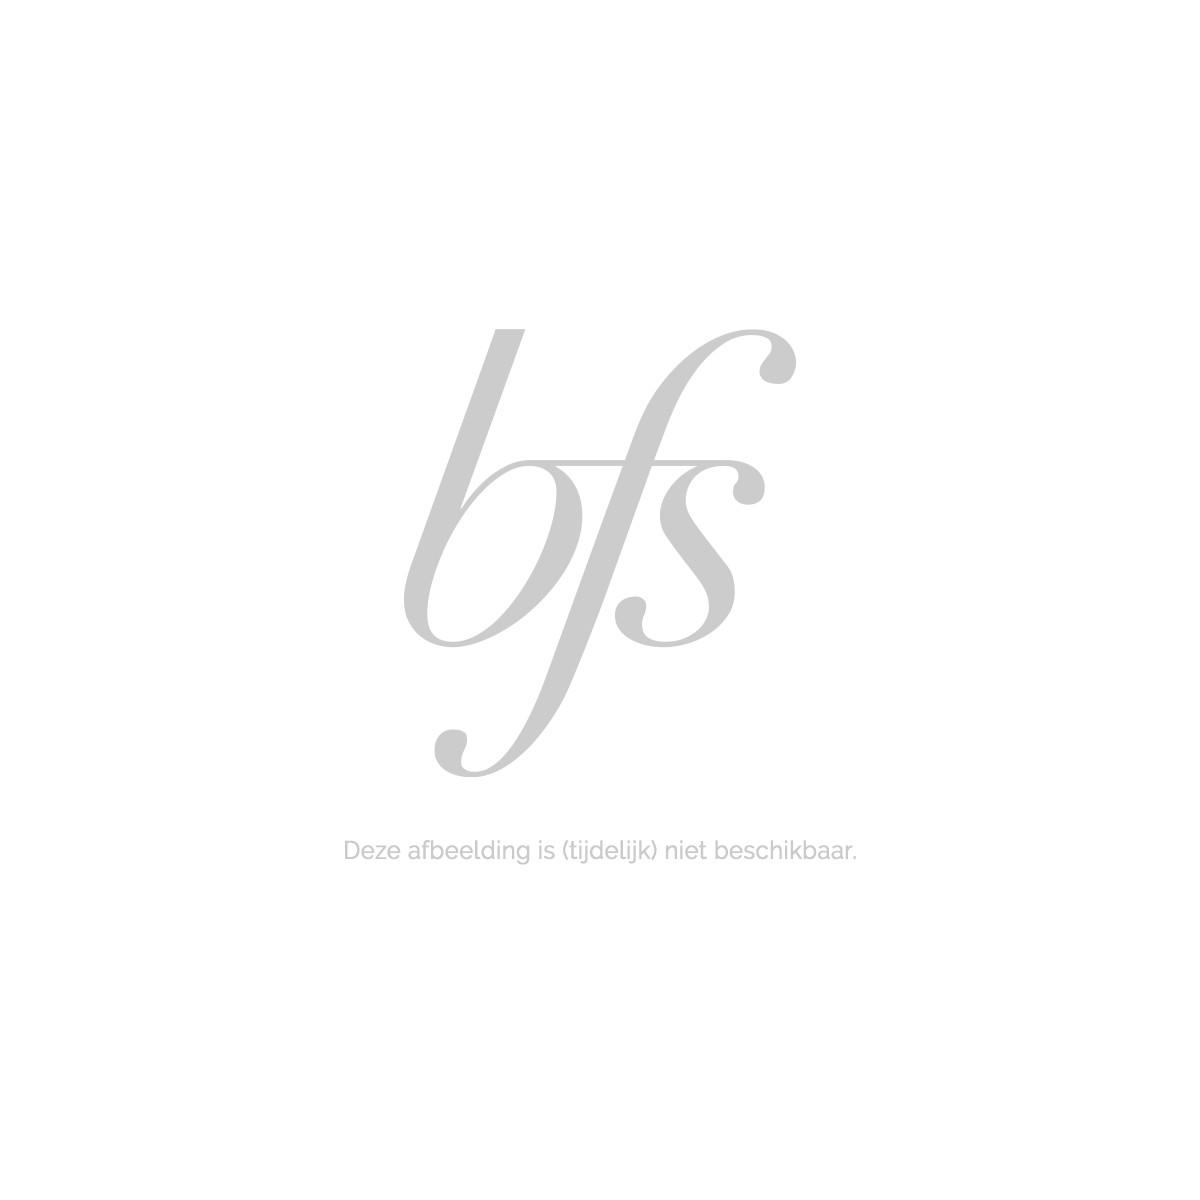 Yves Saint Laurent Rpc Vernis A Levres Vinyl Creamy Lip Stain #410 Fuschia Live 5,5 Ml